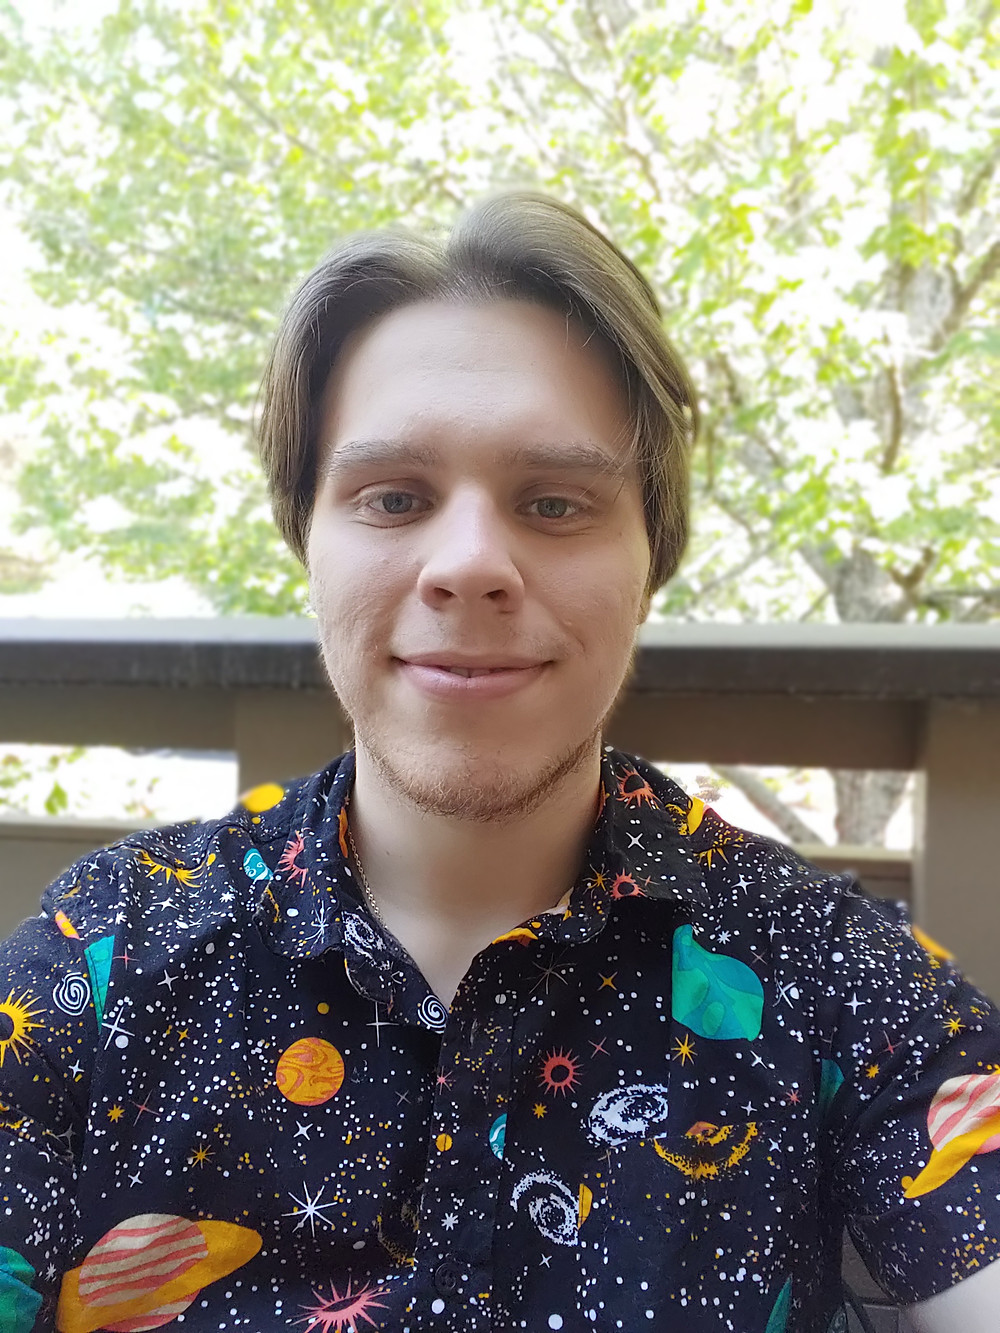 Connor Shea, Programmer, Game Designer